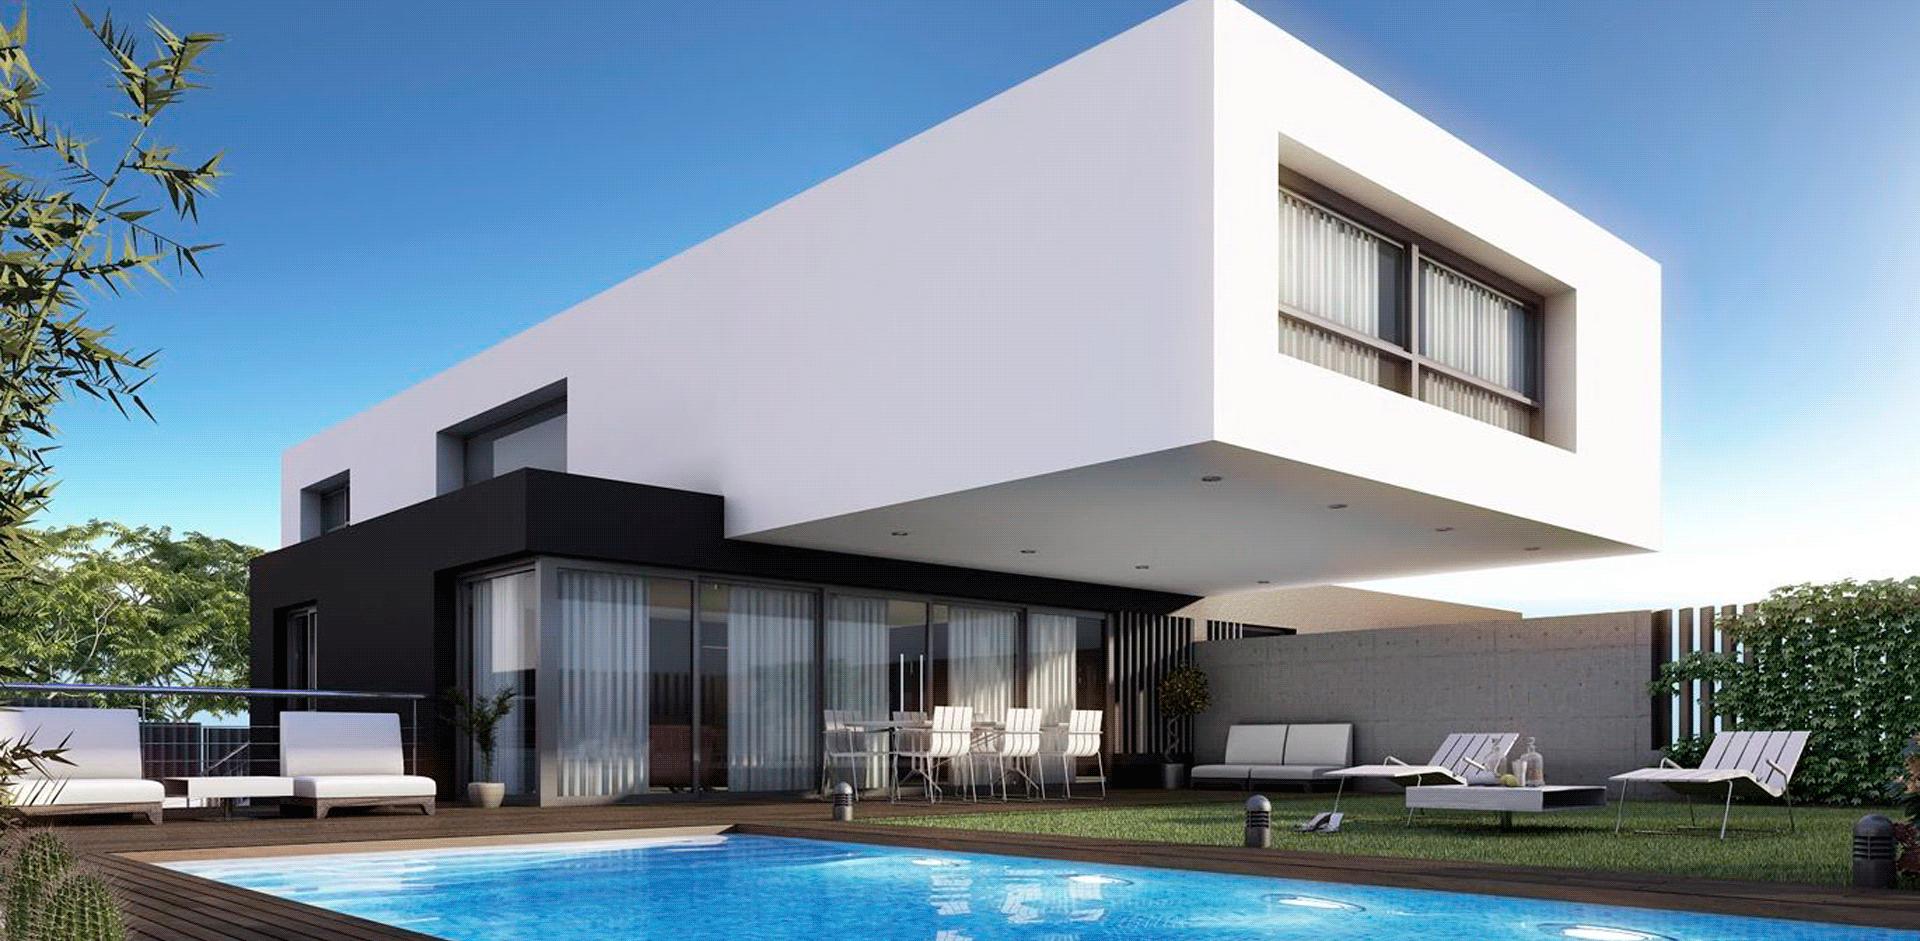 casas prefabricadas con isocontainers Mojuru